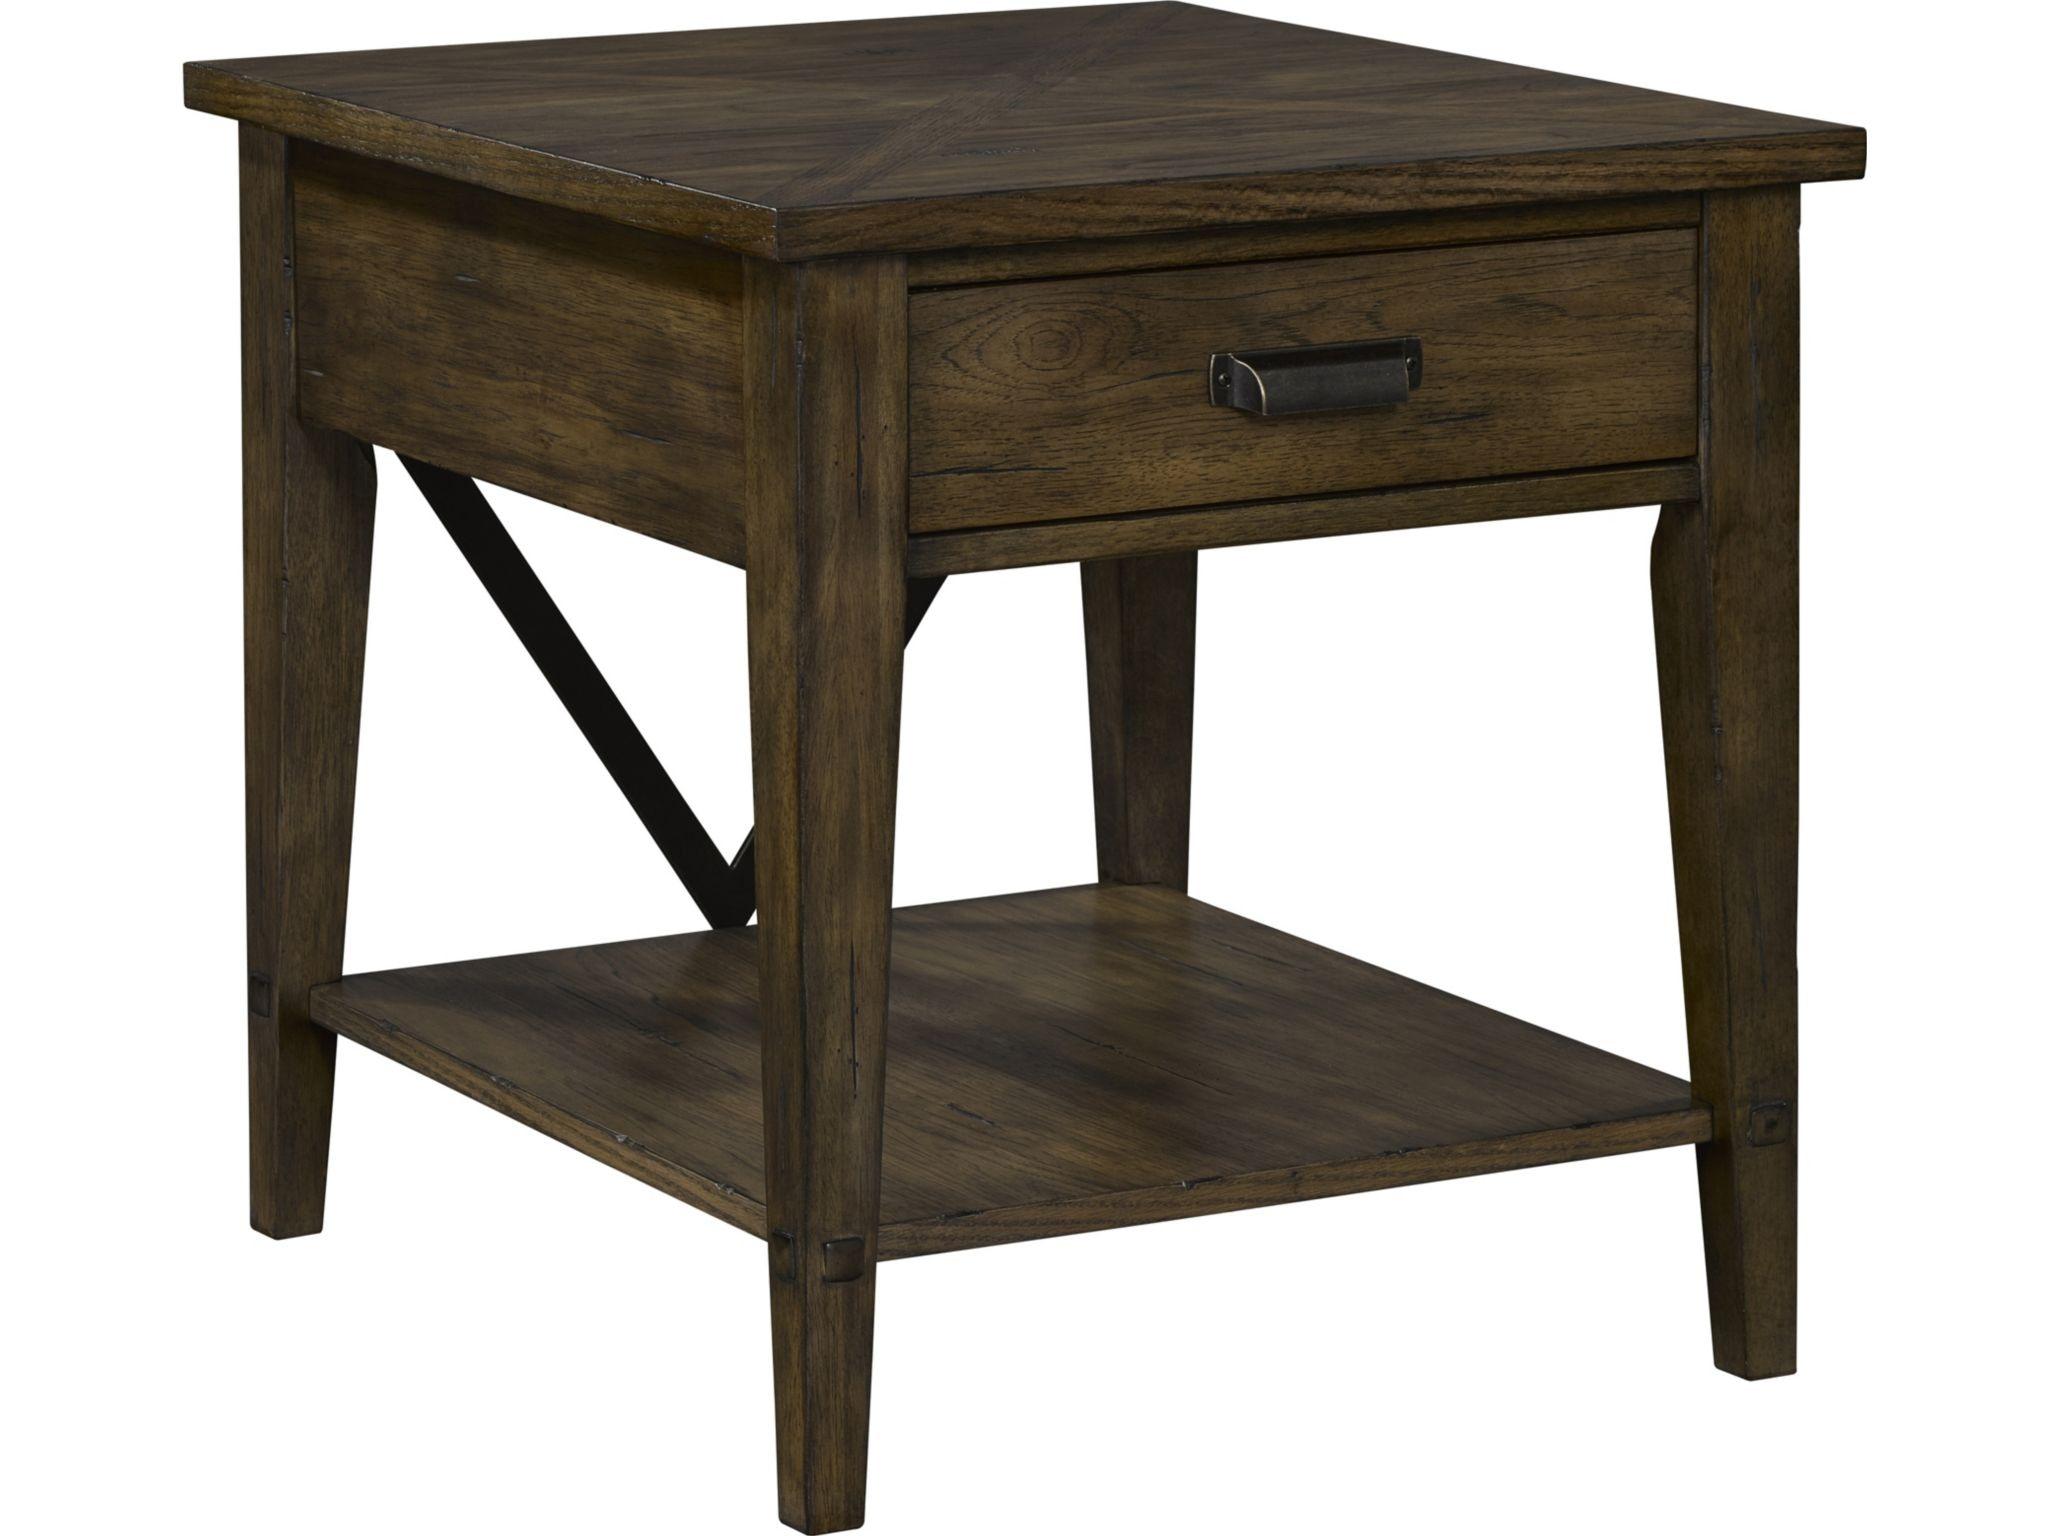 Broyhill Creedmoor™ Drawer End Table 3113 002